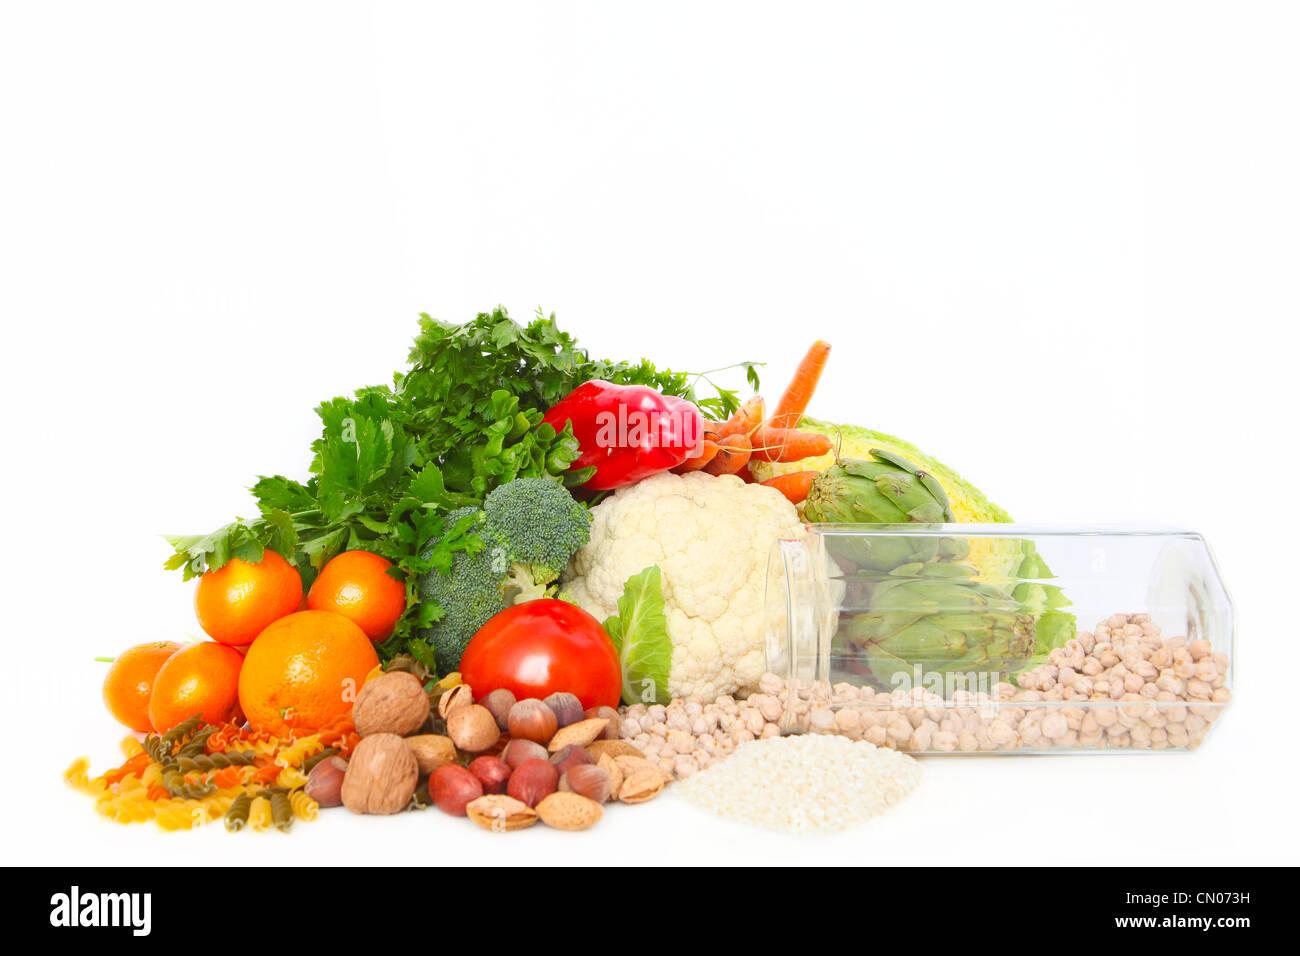 healthy fresh food - Stock Image